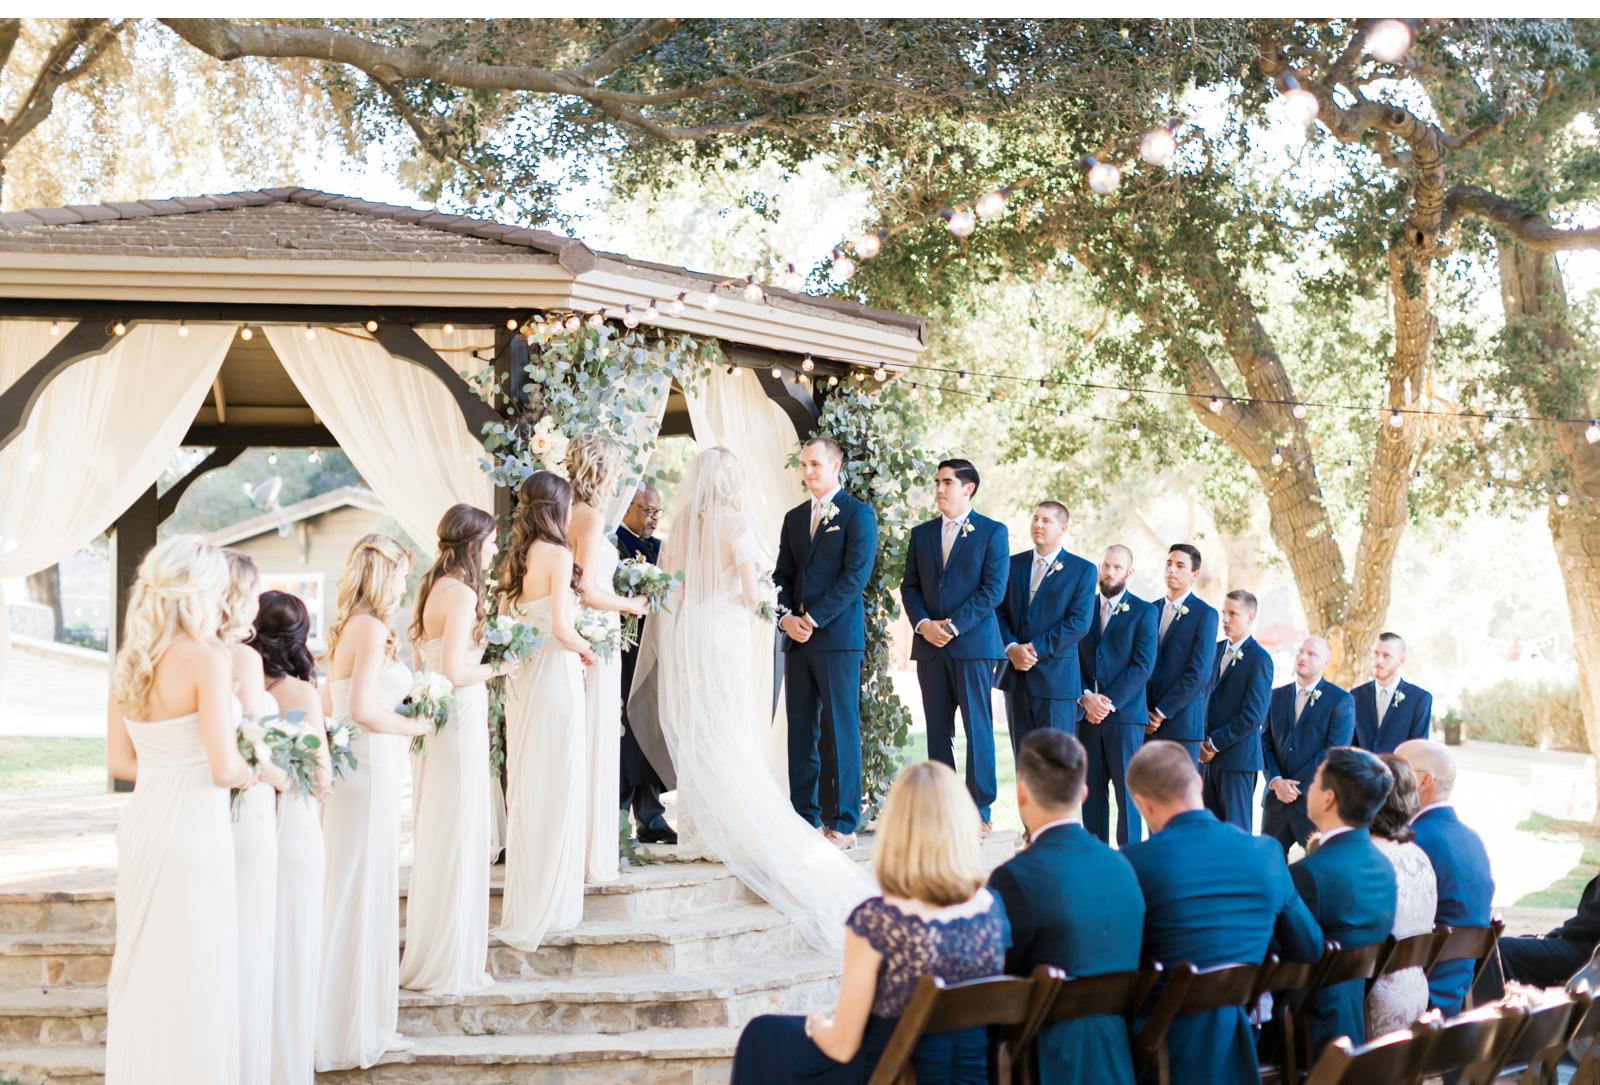 Style-Me-Pretty-Wedding-Photographer-Natalie-Schutt-Photography-Calfornia-San-Luis-Obispo_03.jpg